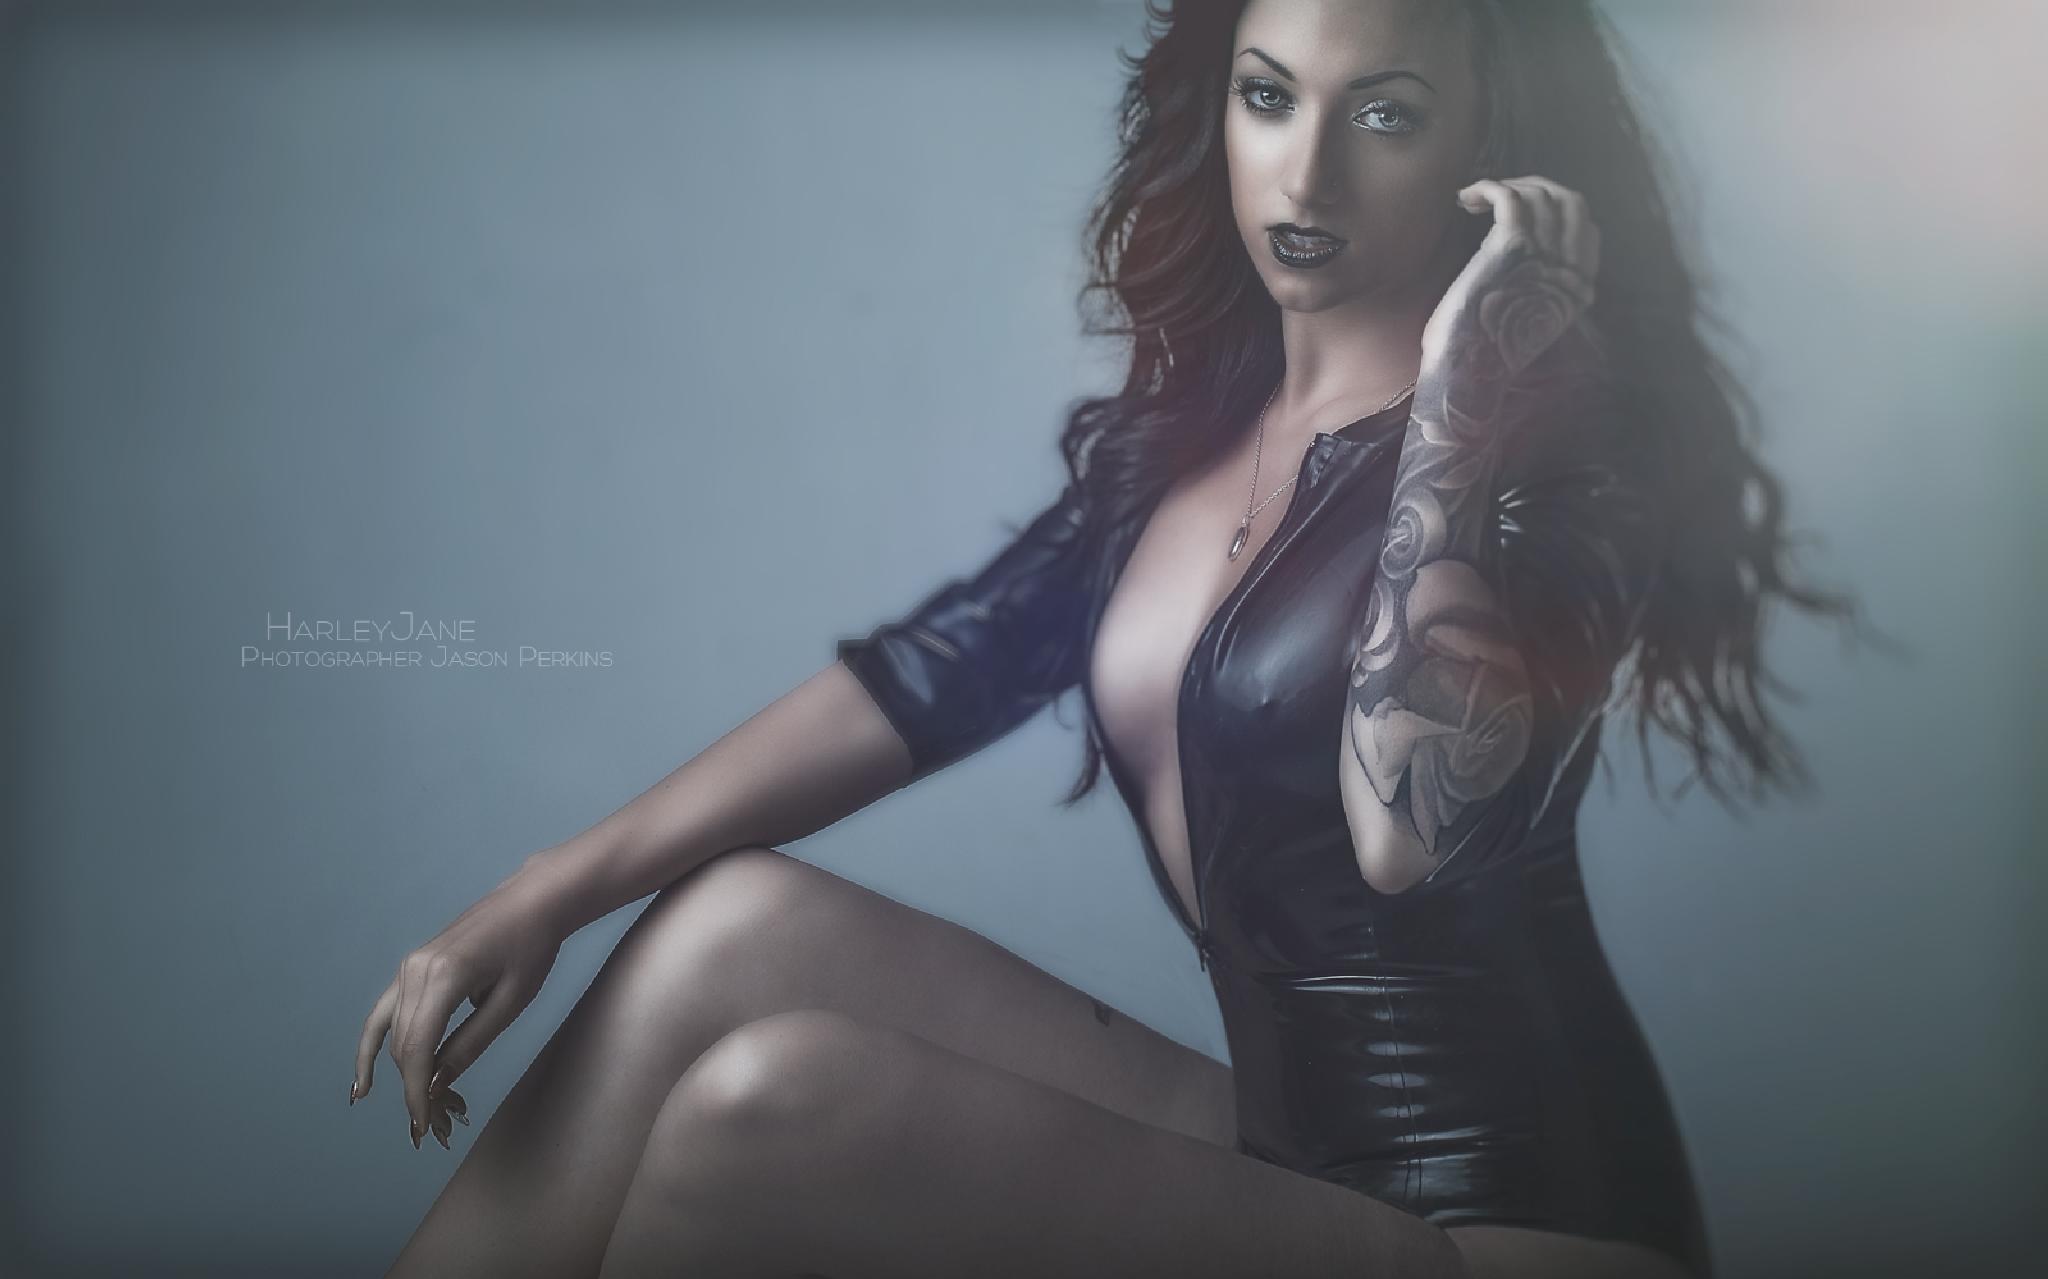 Harley by Jason Perkins